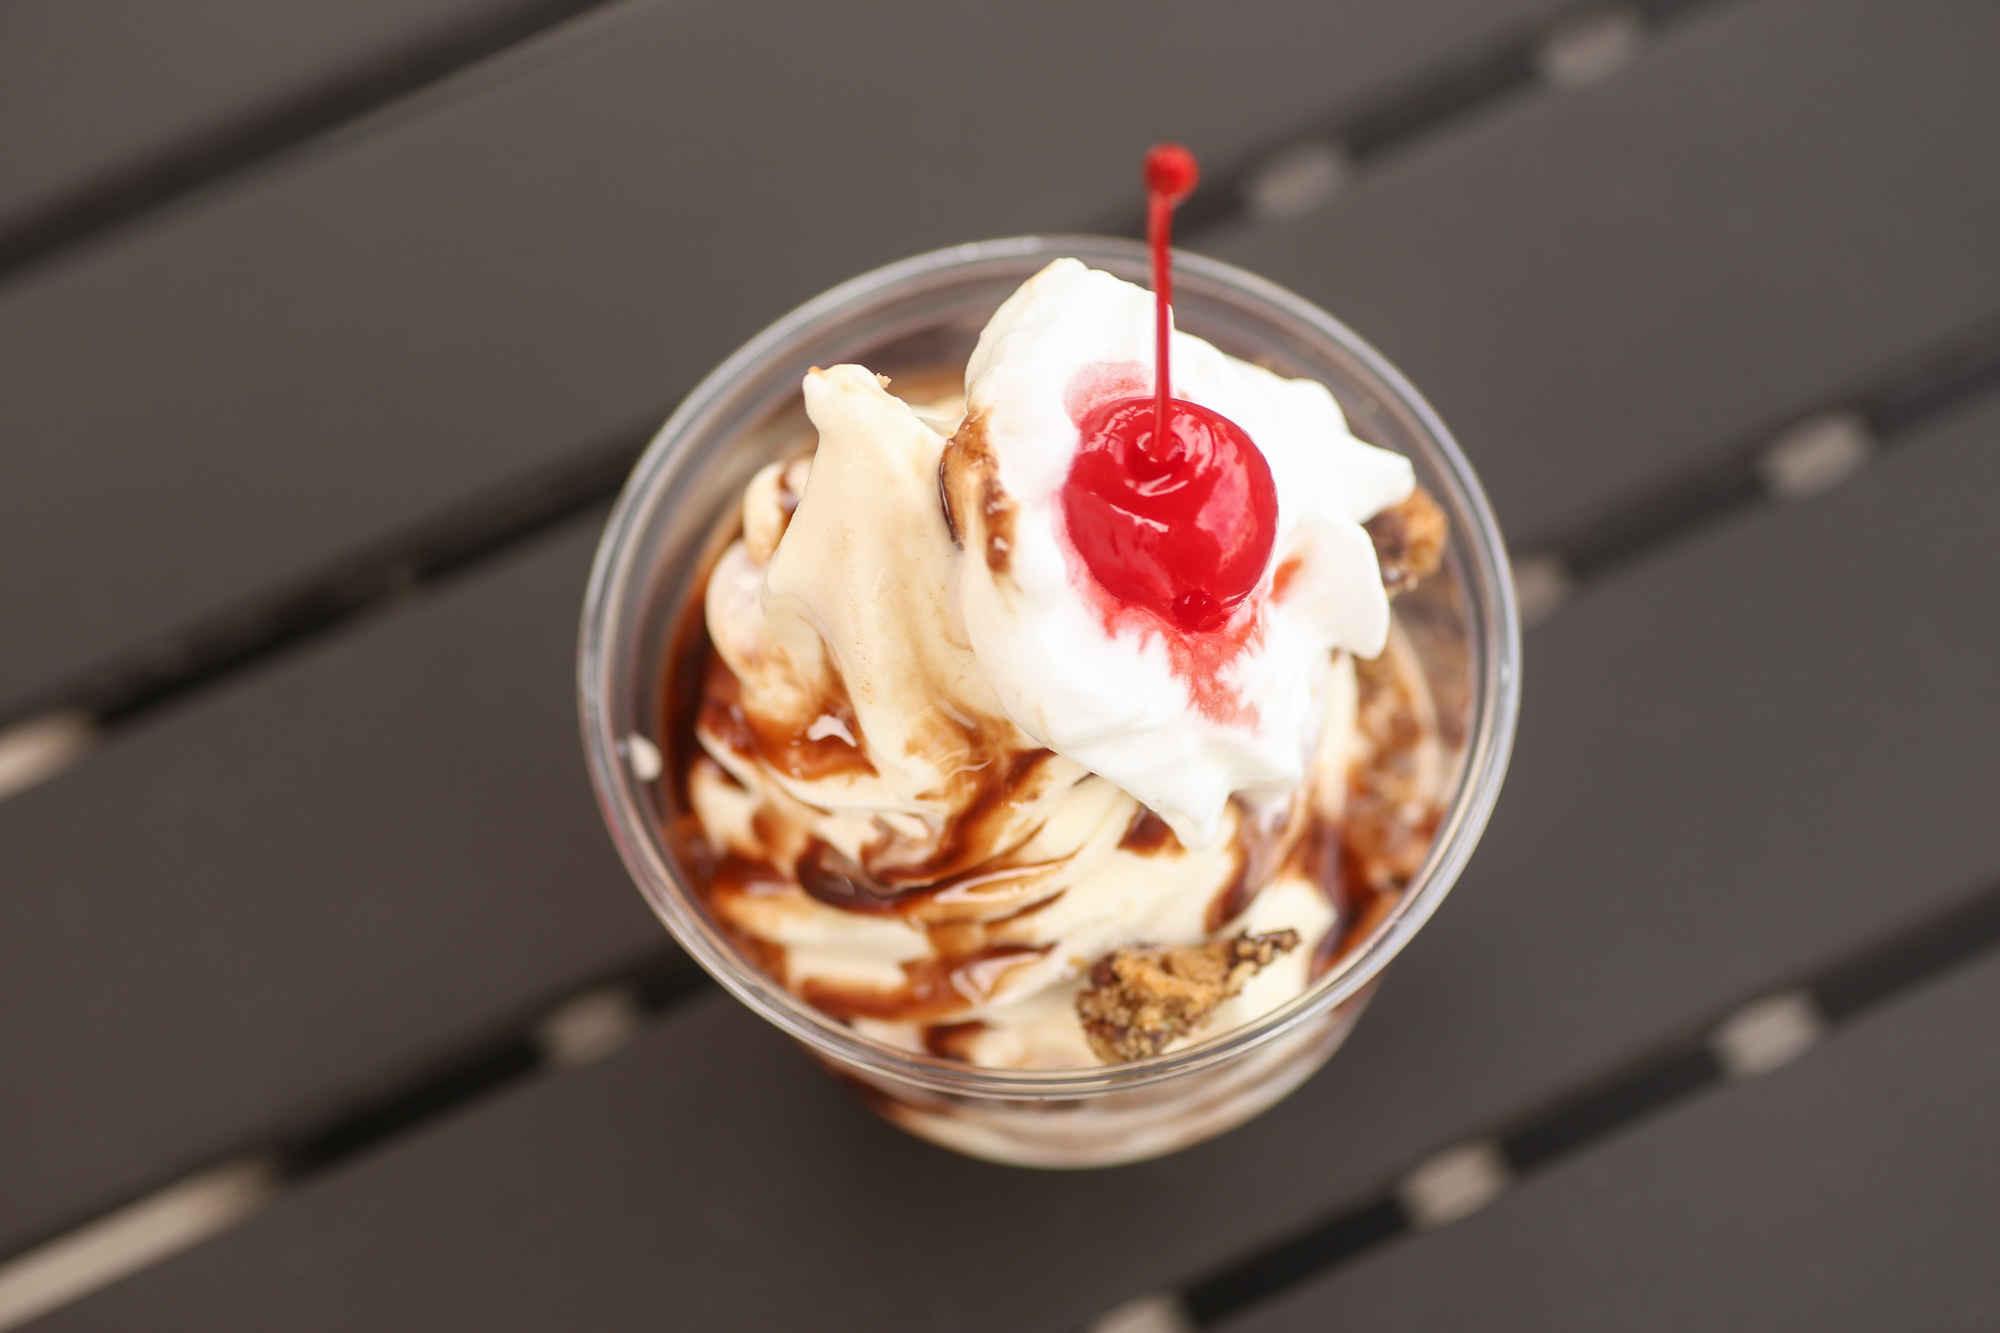 Chick Fil A Dessert Menu  Ranking the Best Frozen Fast Food Desserts